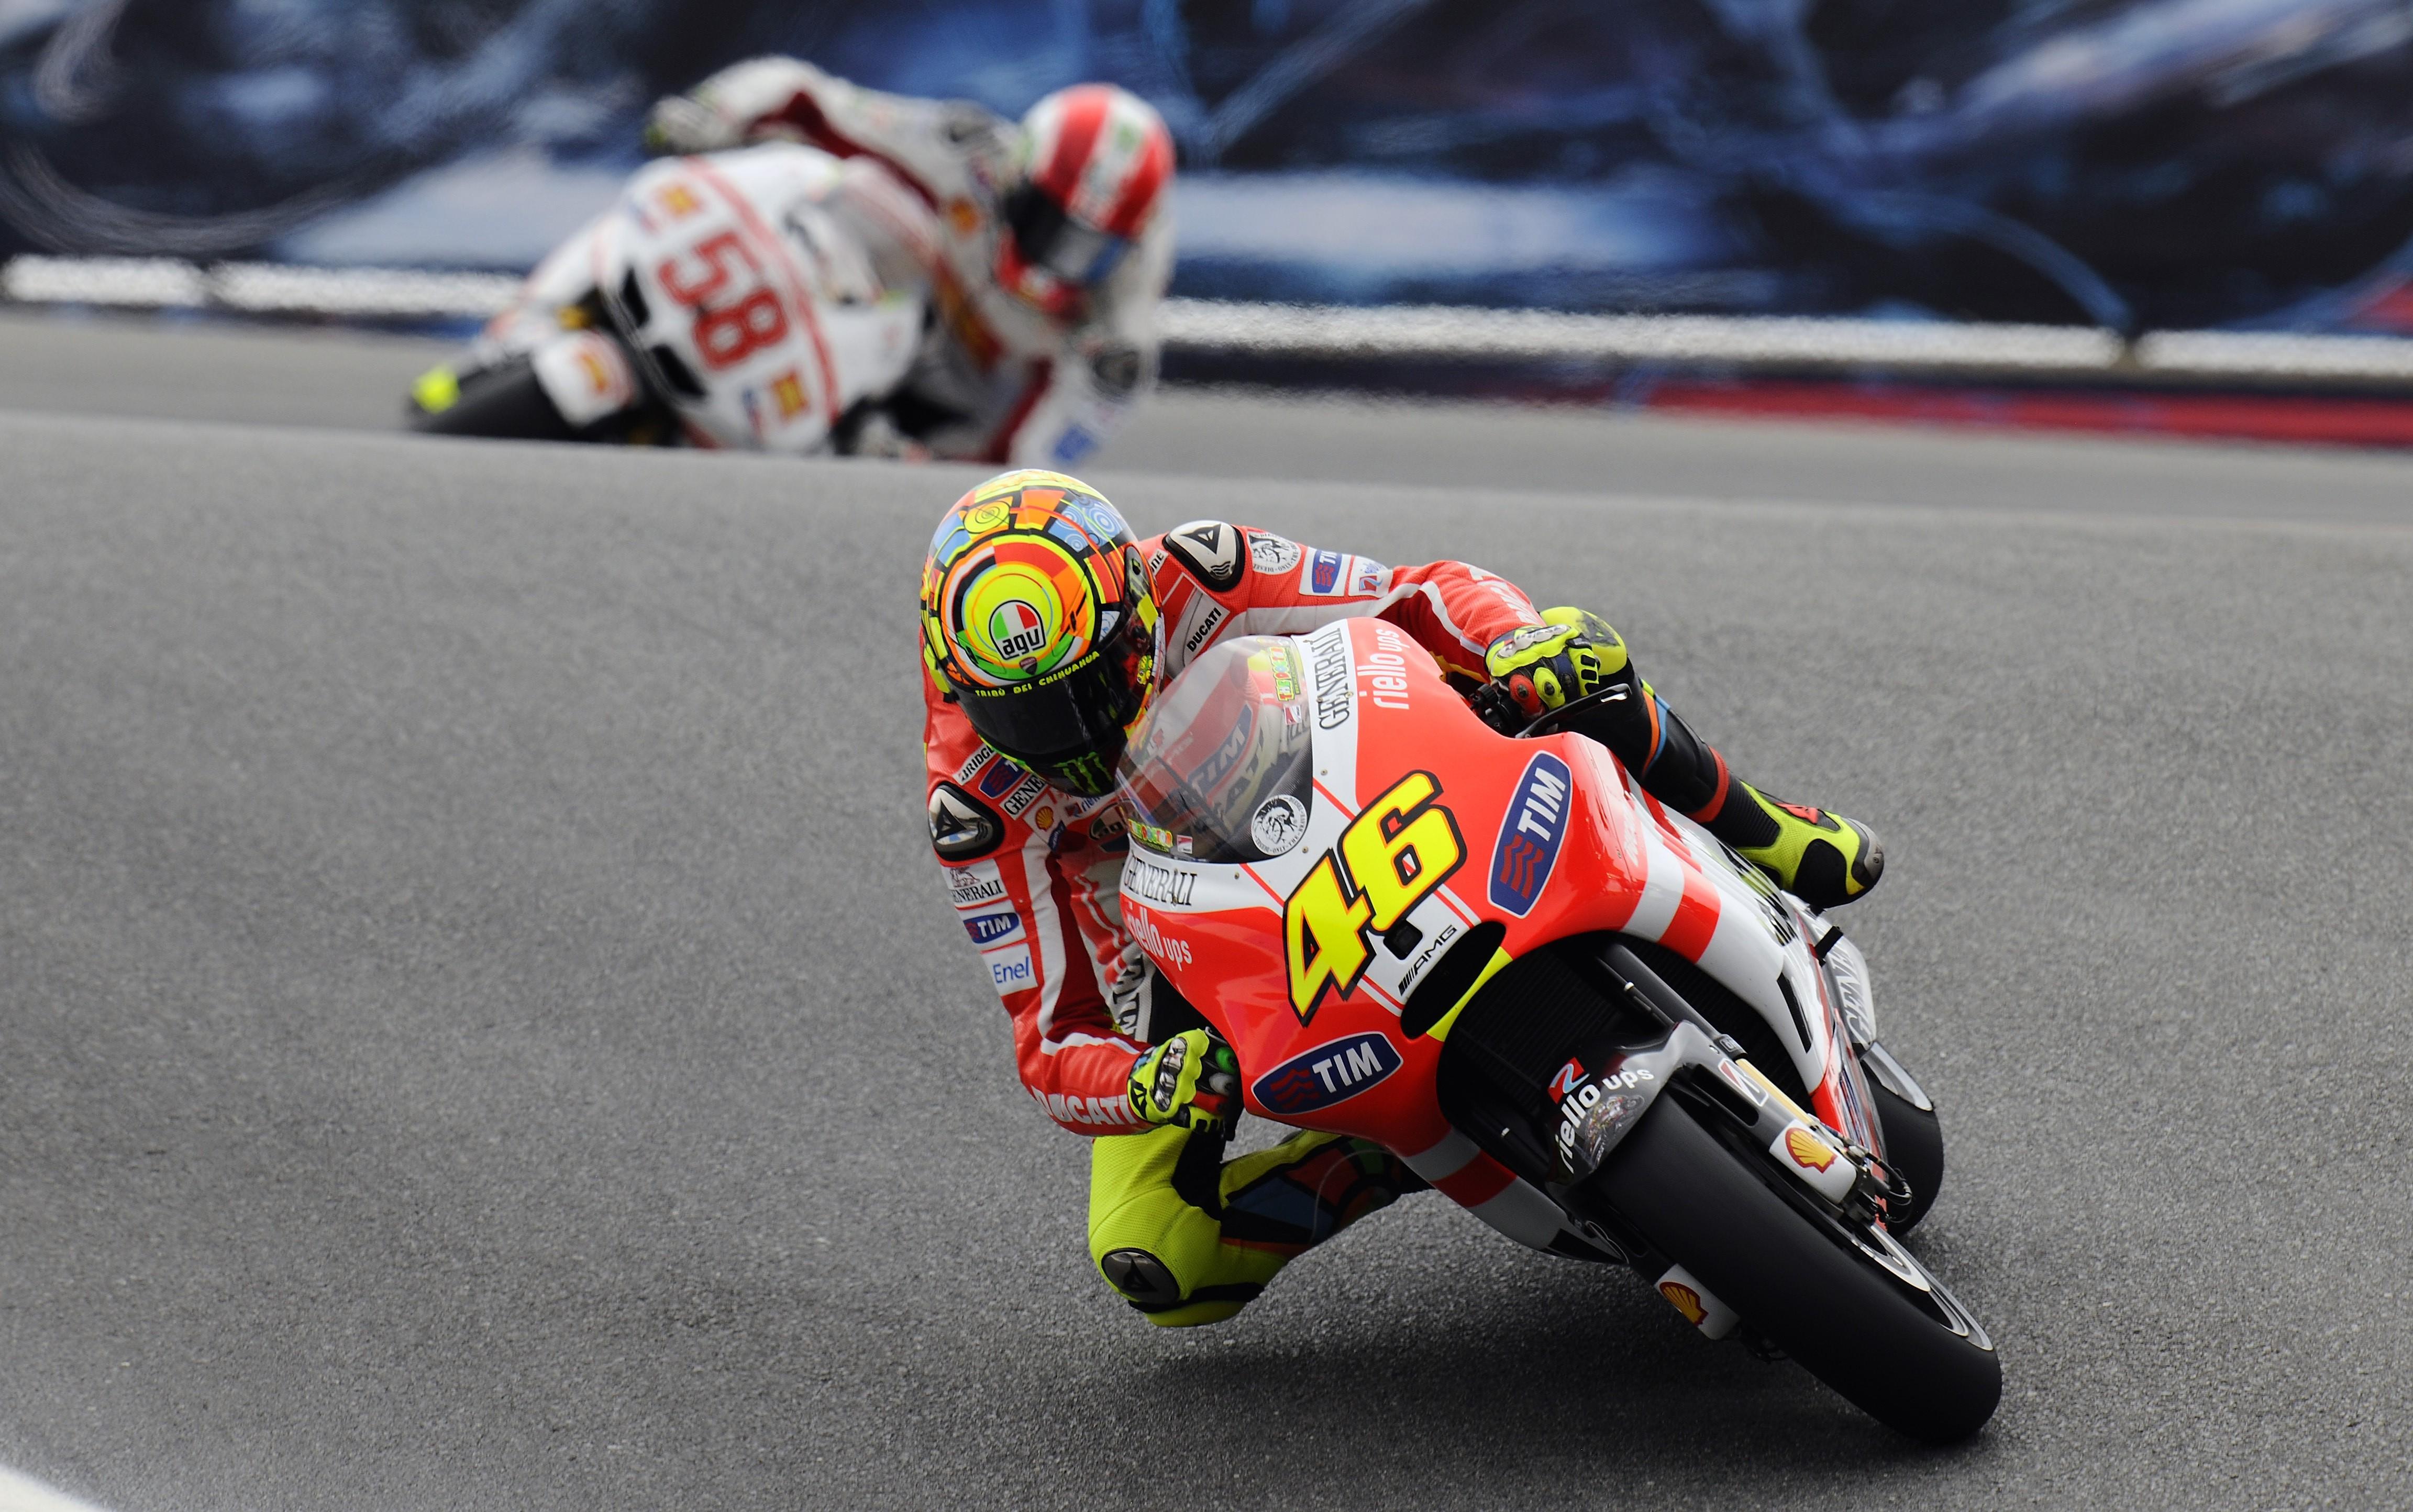 Motos Ducati GP - 4608x2888